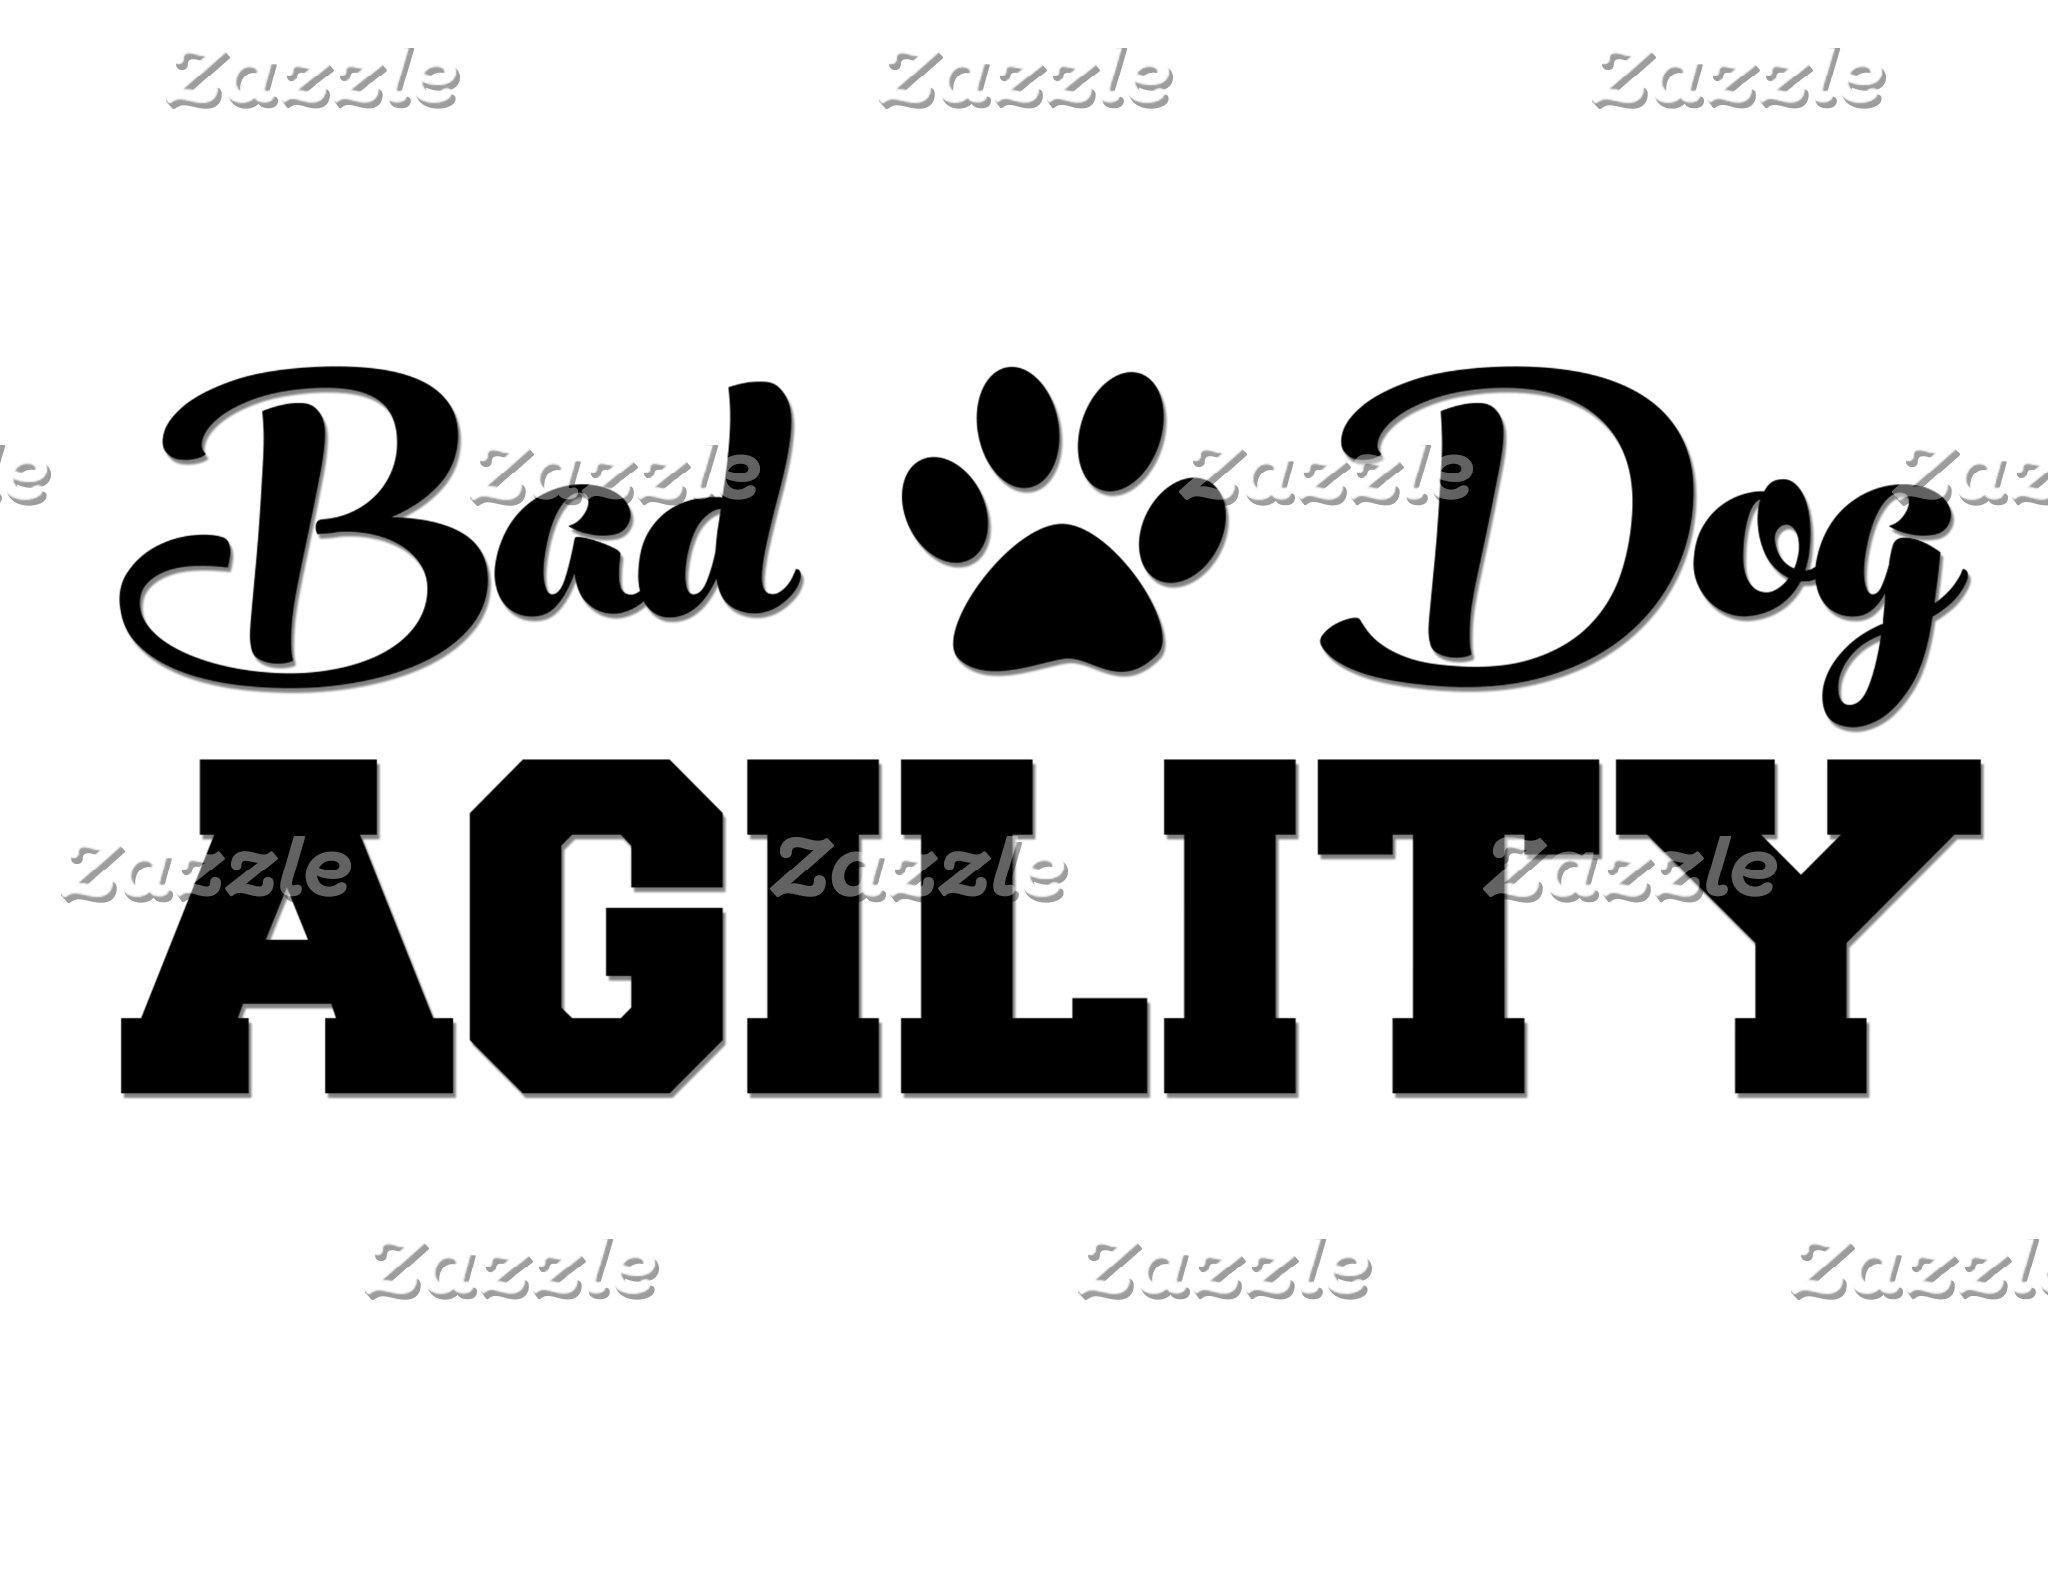 Cursive Bad Dog, Block Agility